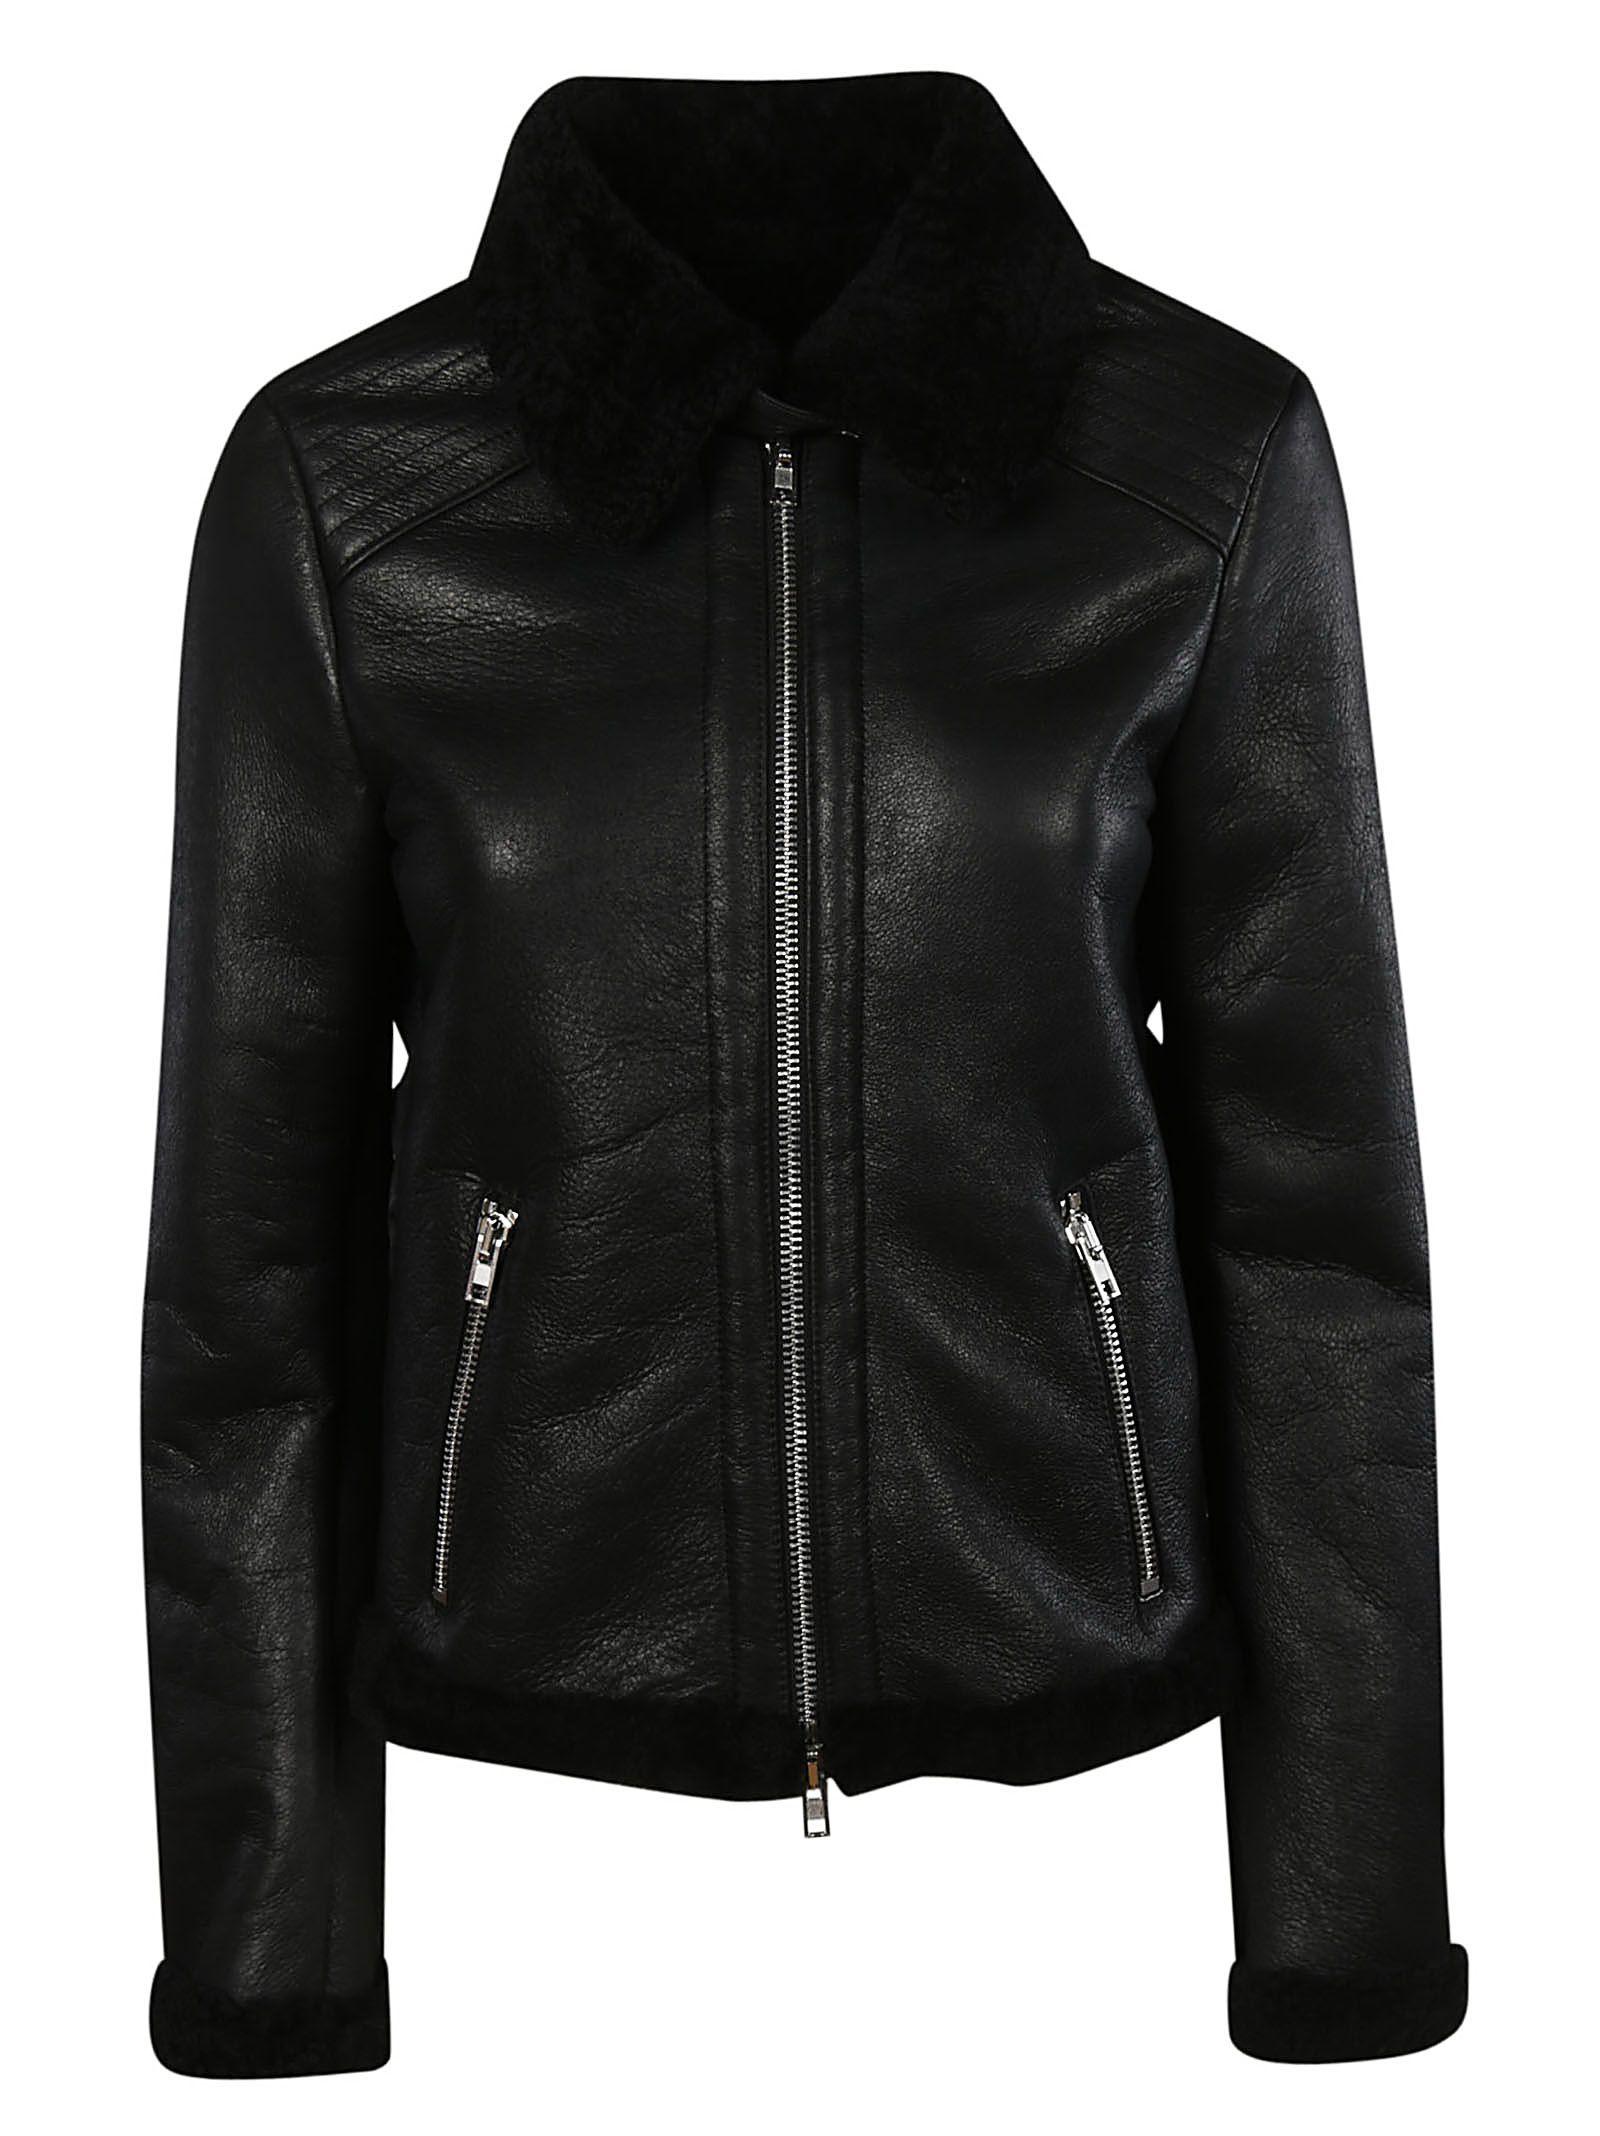 Montone Jacket in Nero